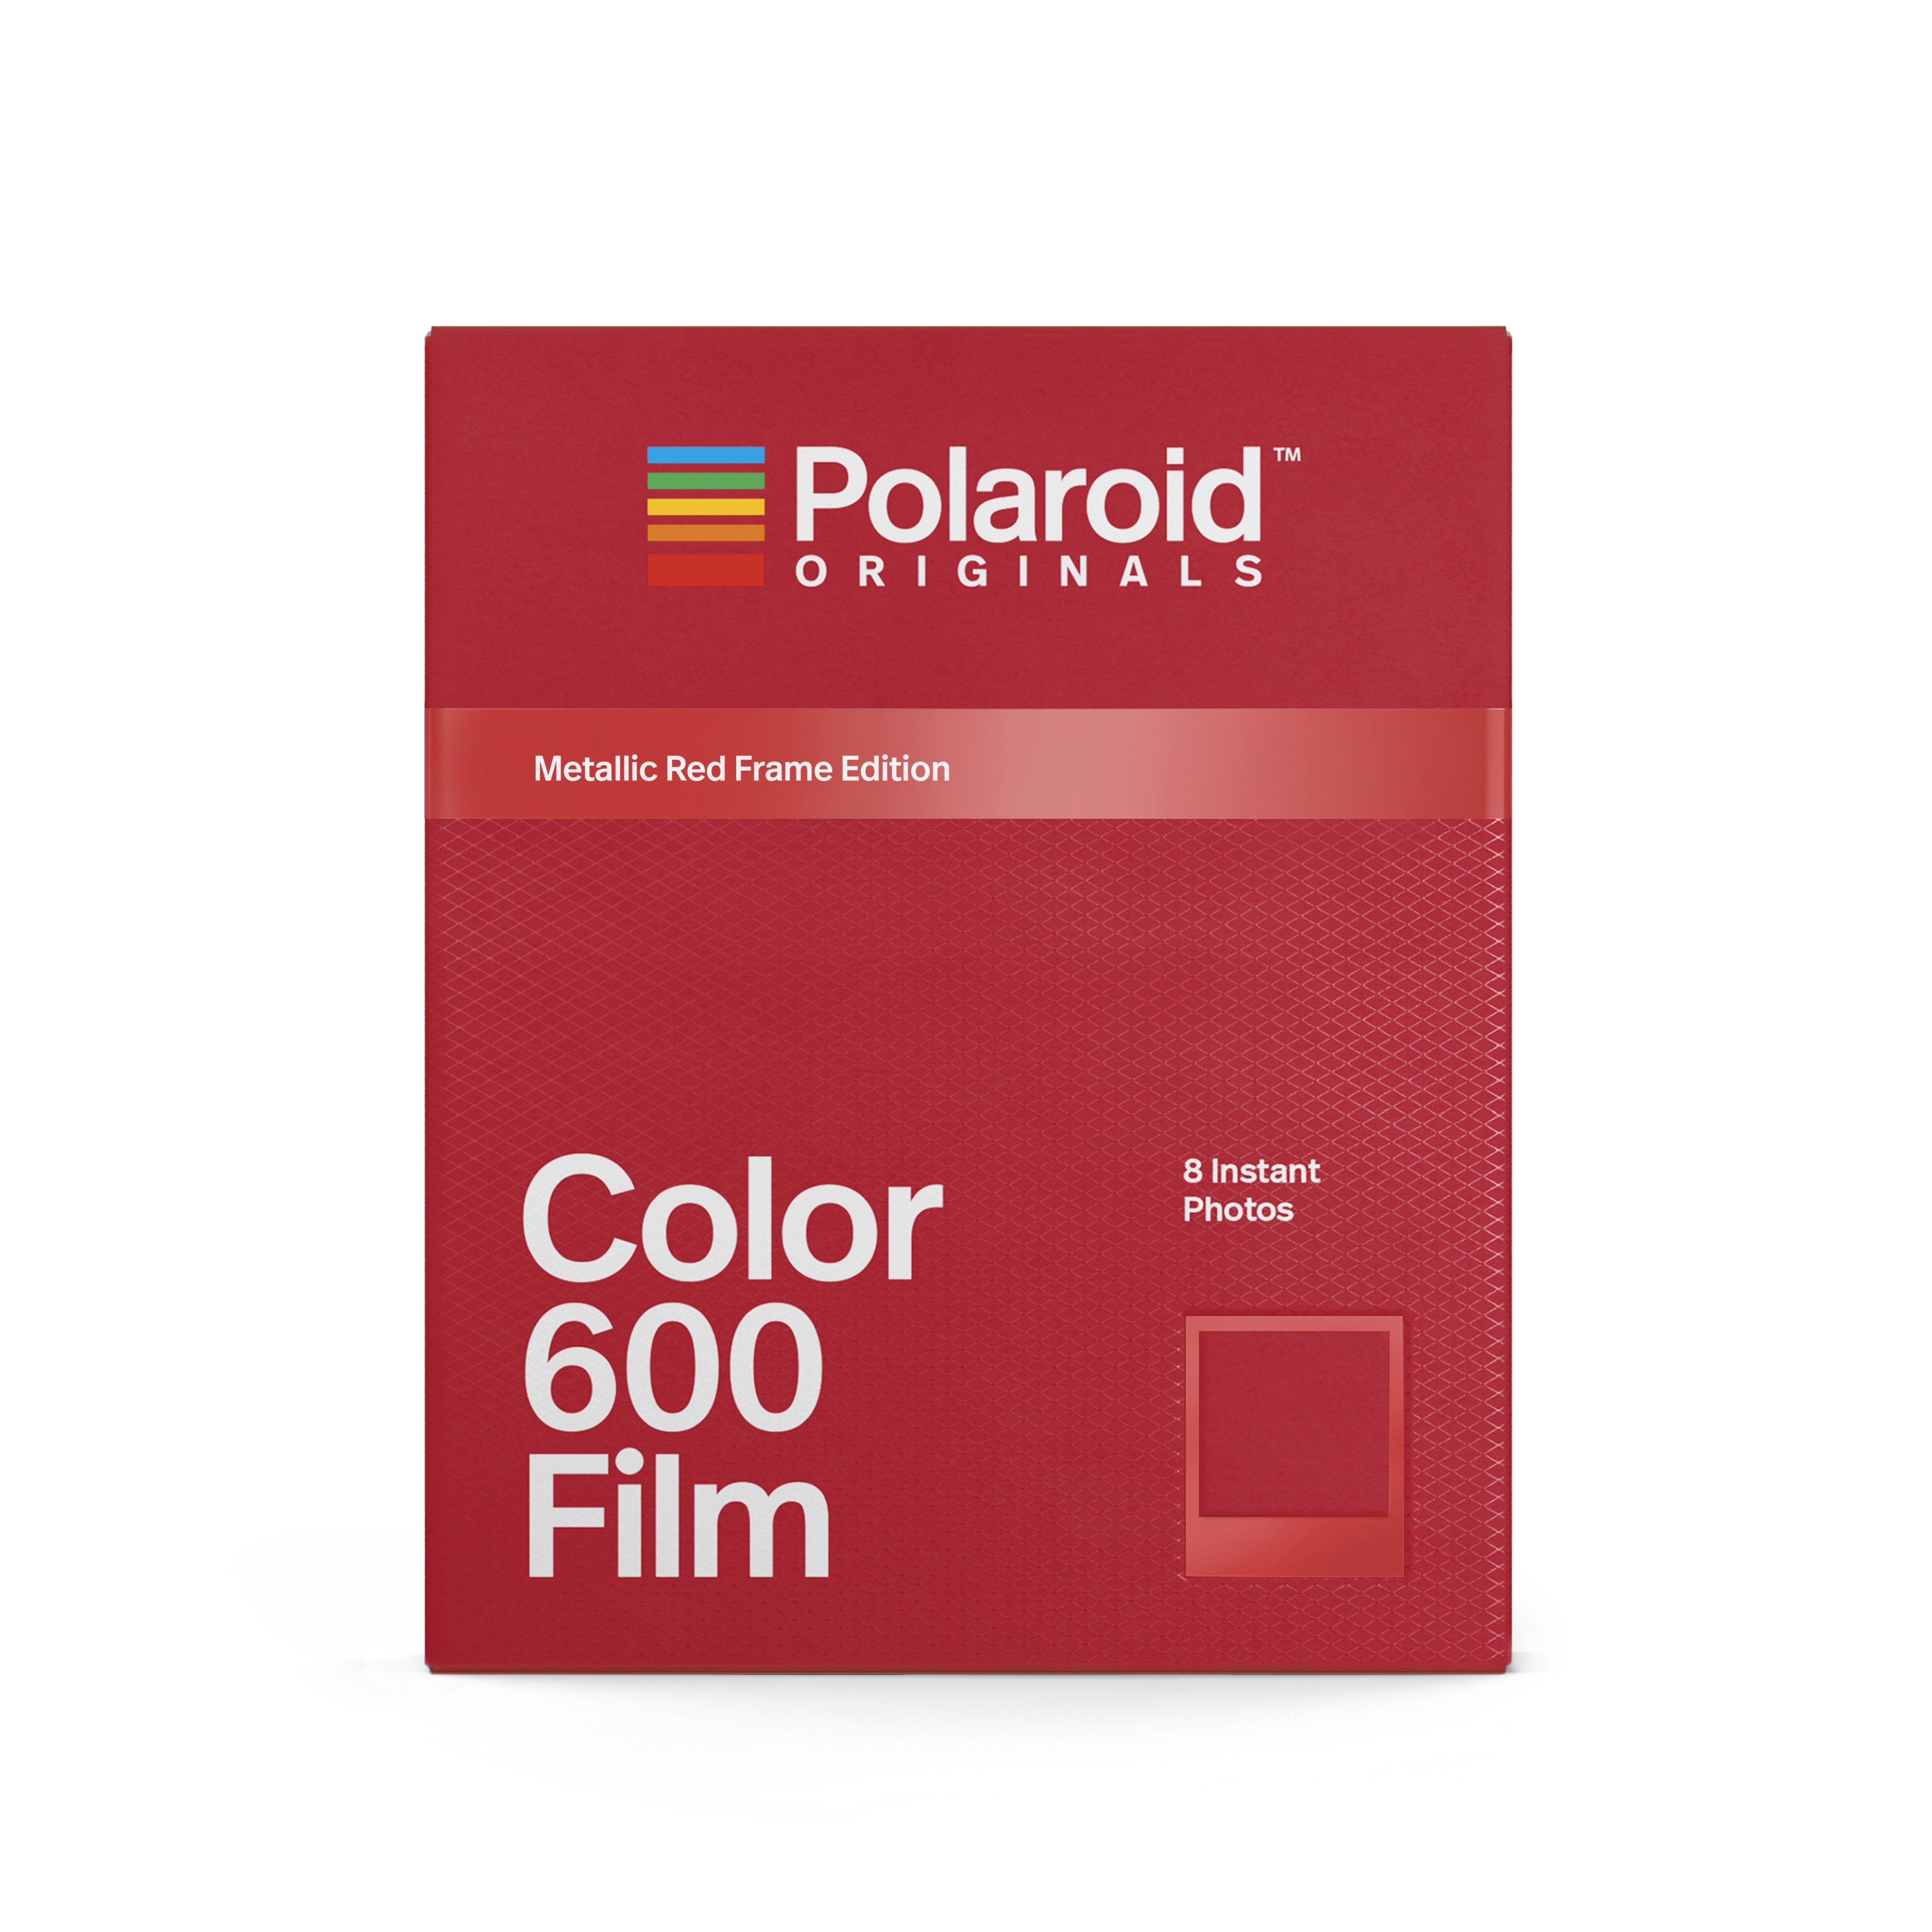 Polaroid Originals Color Film for 600-Metallic Red Frame Edition